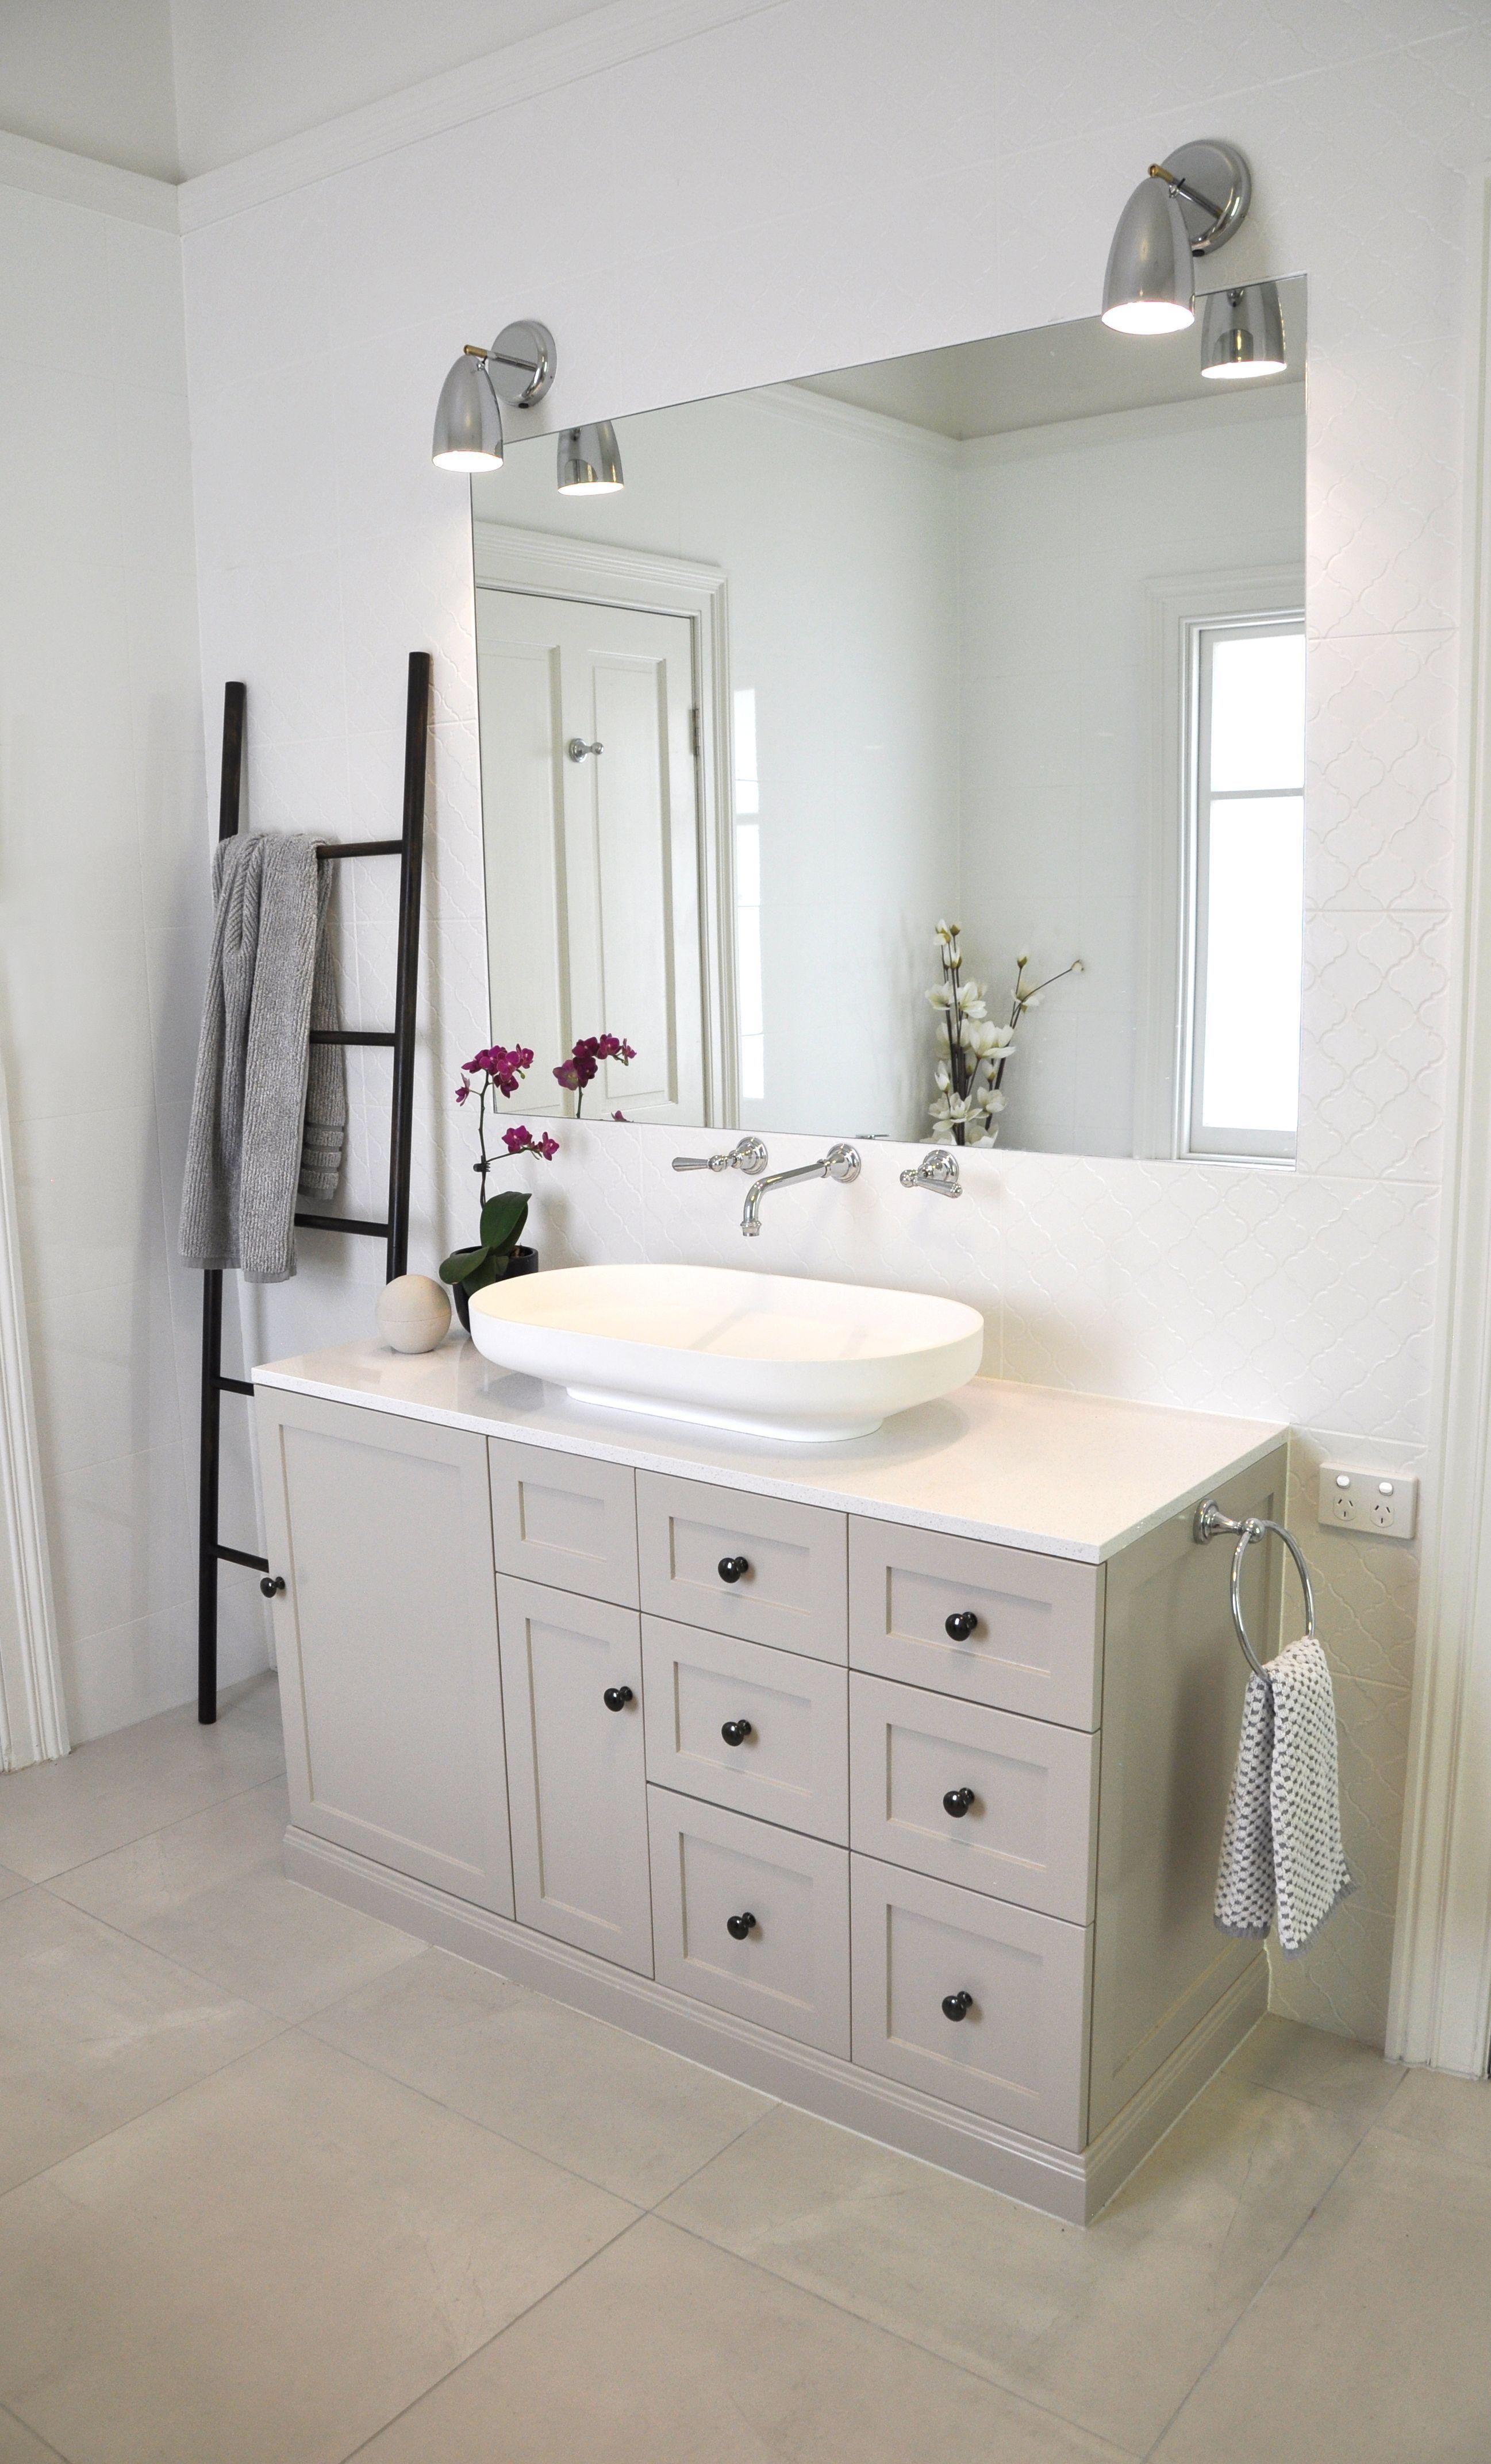 Valentine interiors + design. Residential bathroom design, Hobart ...